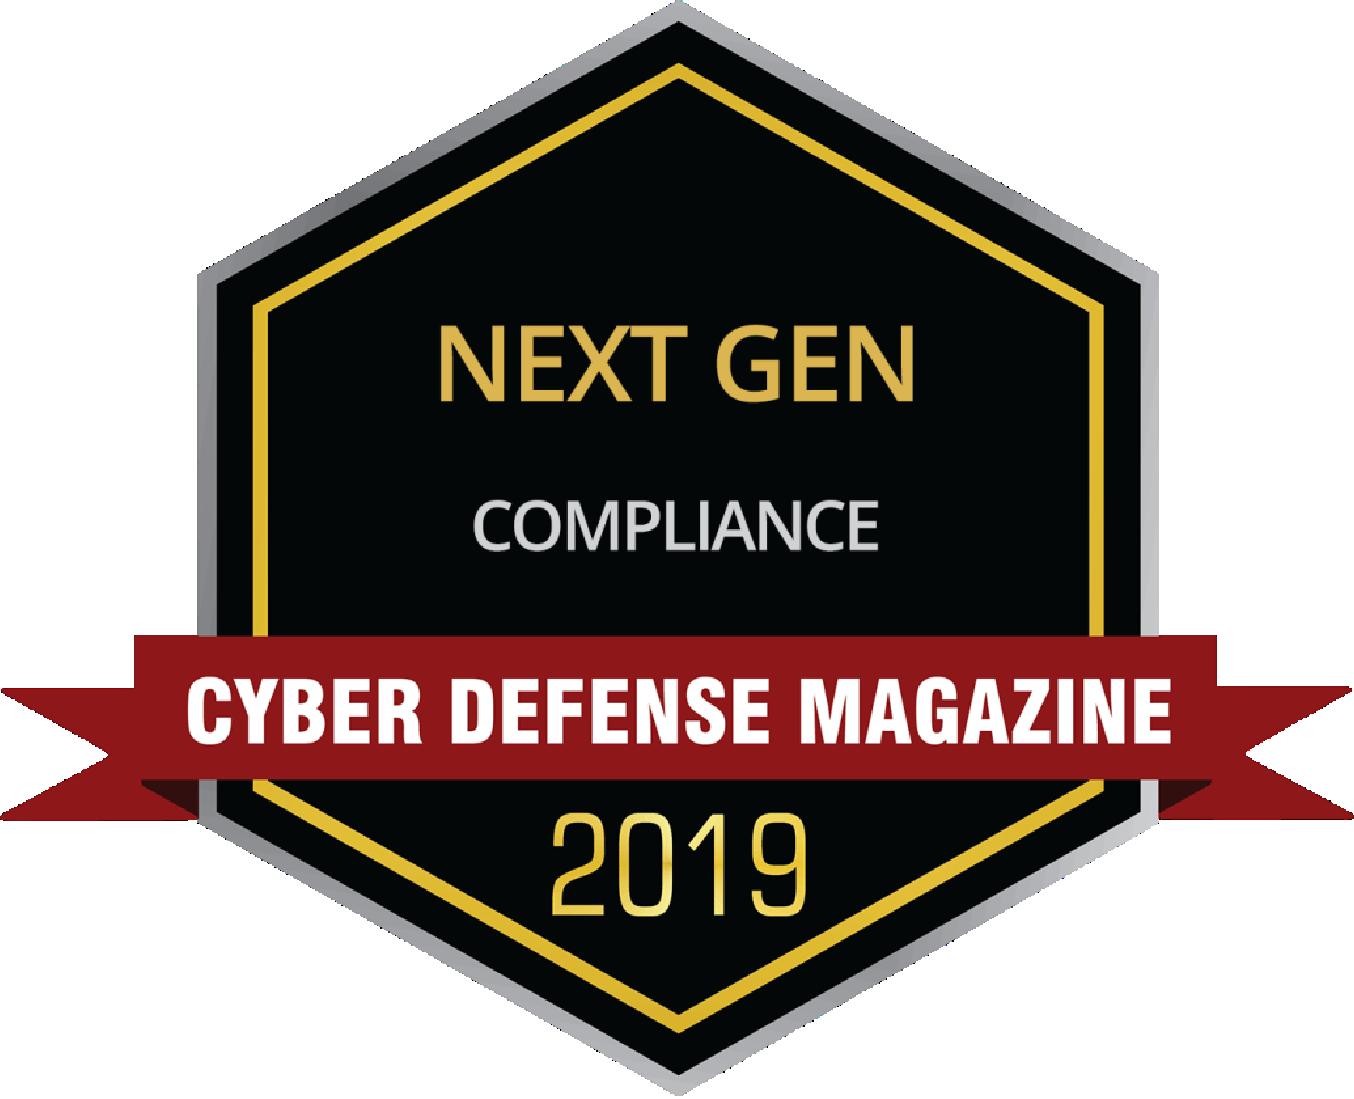 Compliance CDM Award_SafeGuard Cyber_2019 (1)